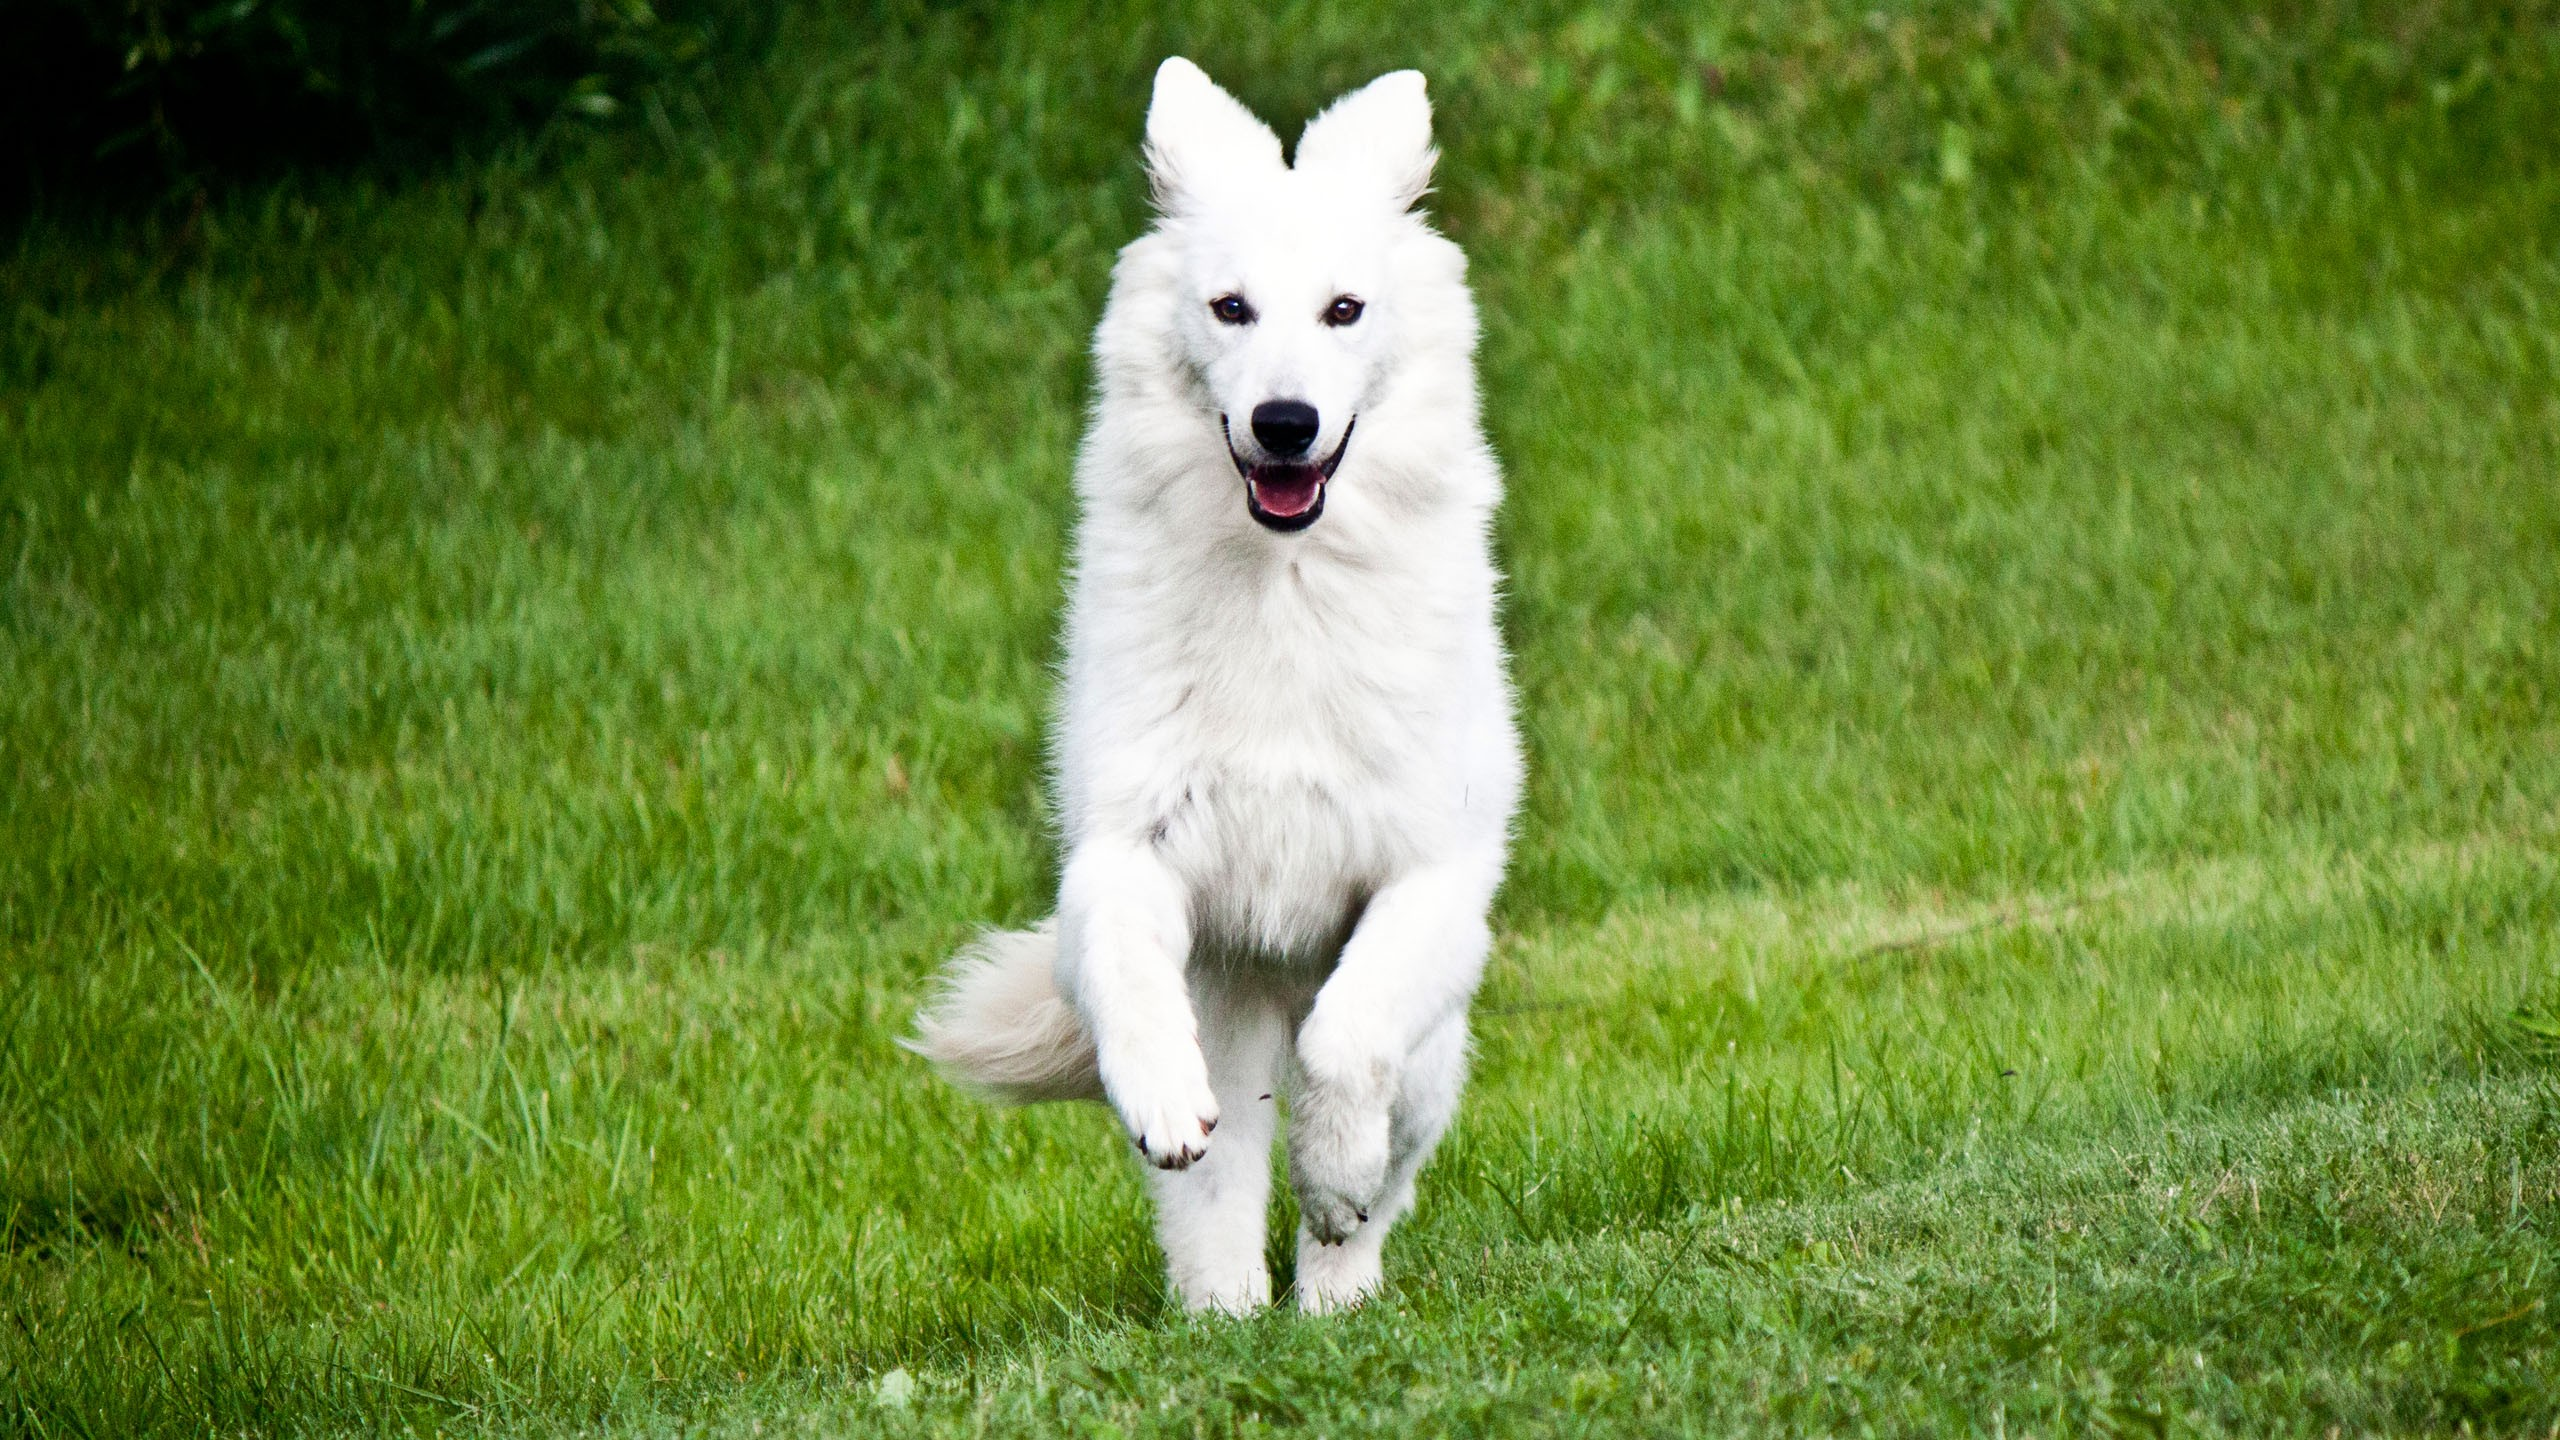 Beautiful White German Shepherd HD Wallpaper For Desktop 2560x1440